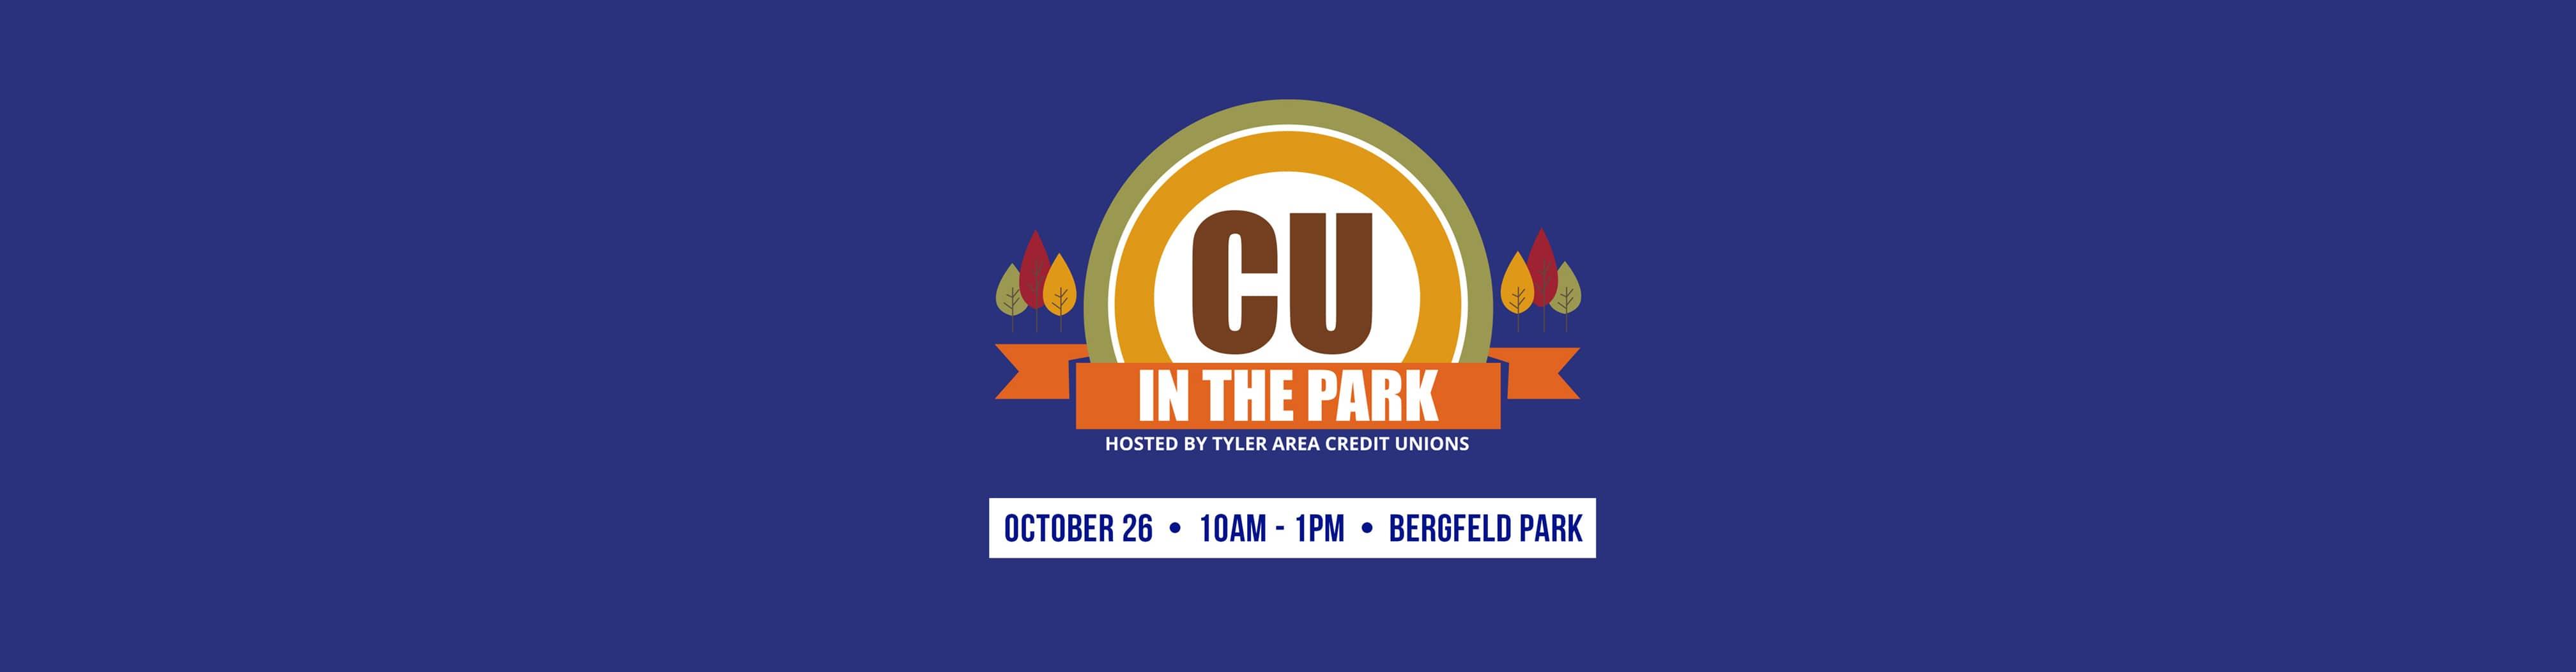 CU in the park